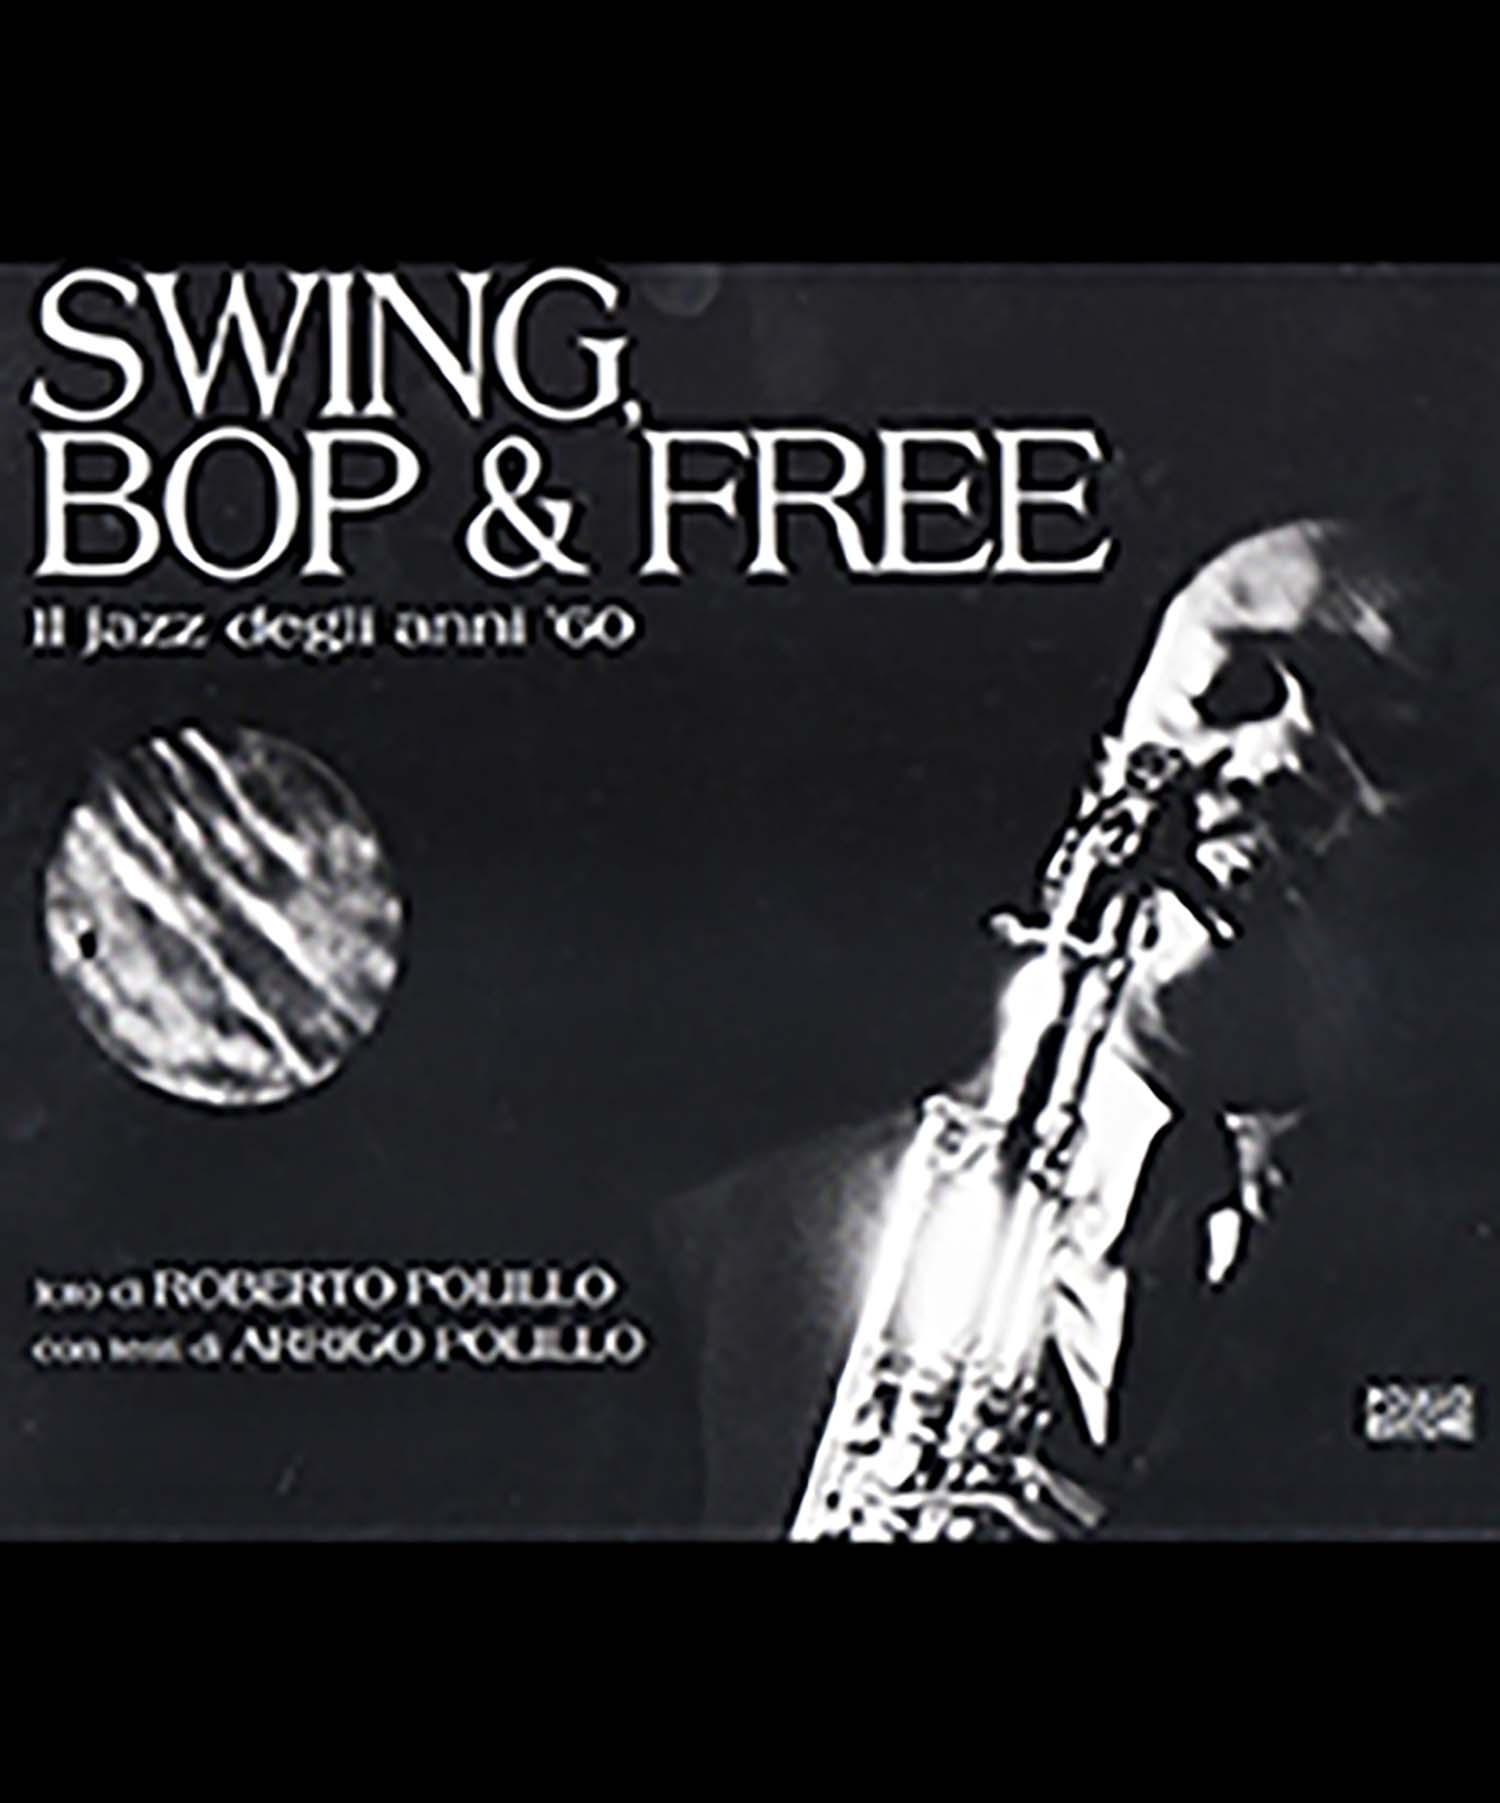 Roberto-Polillo-SWING-BOP-FREE-spazio-base-milano-2016